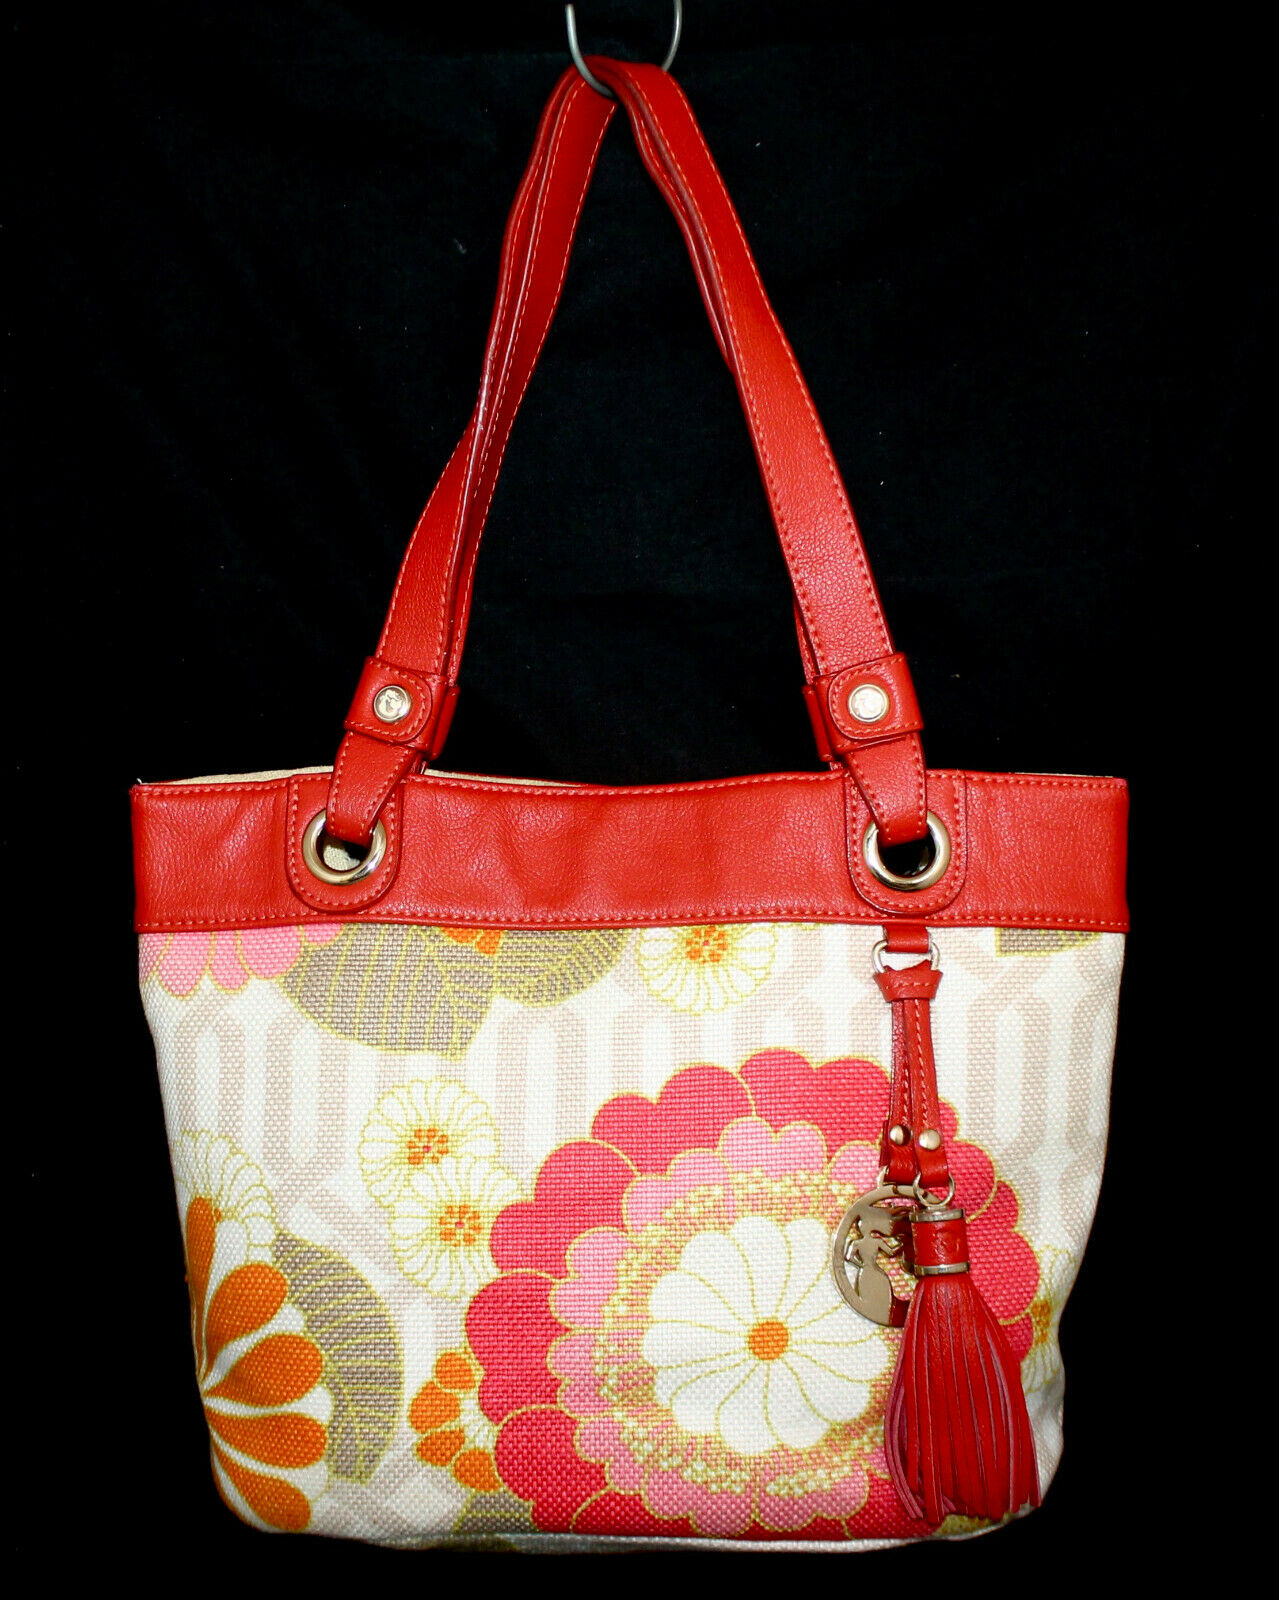 SPARTINA Medium Beige Linen & Leather Tassel Tote Red & Multicolor Floral